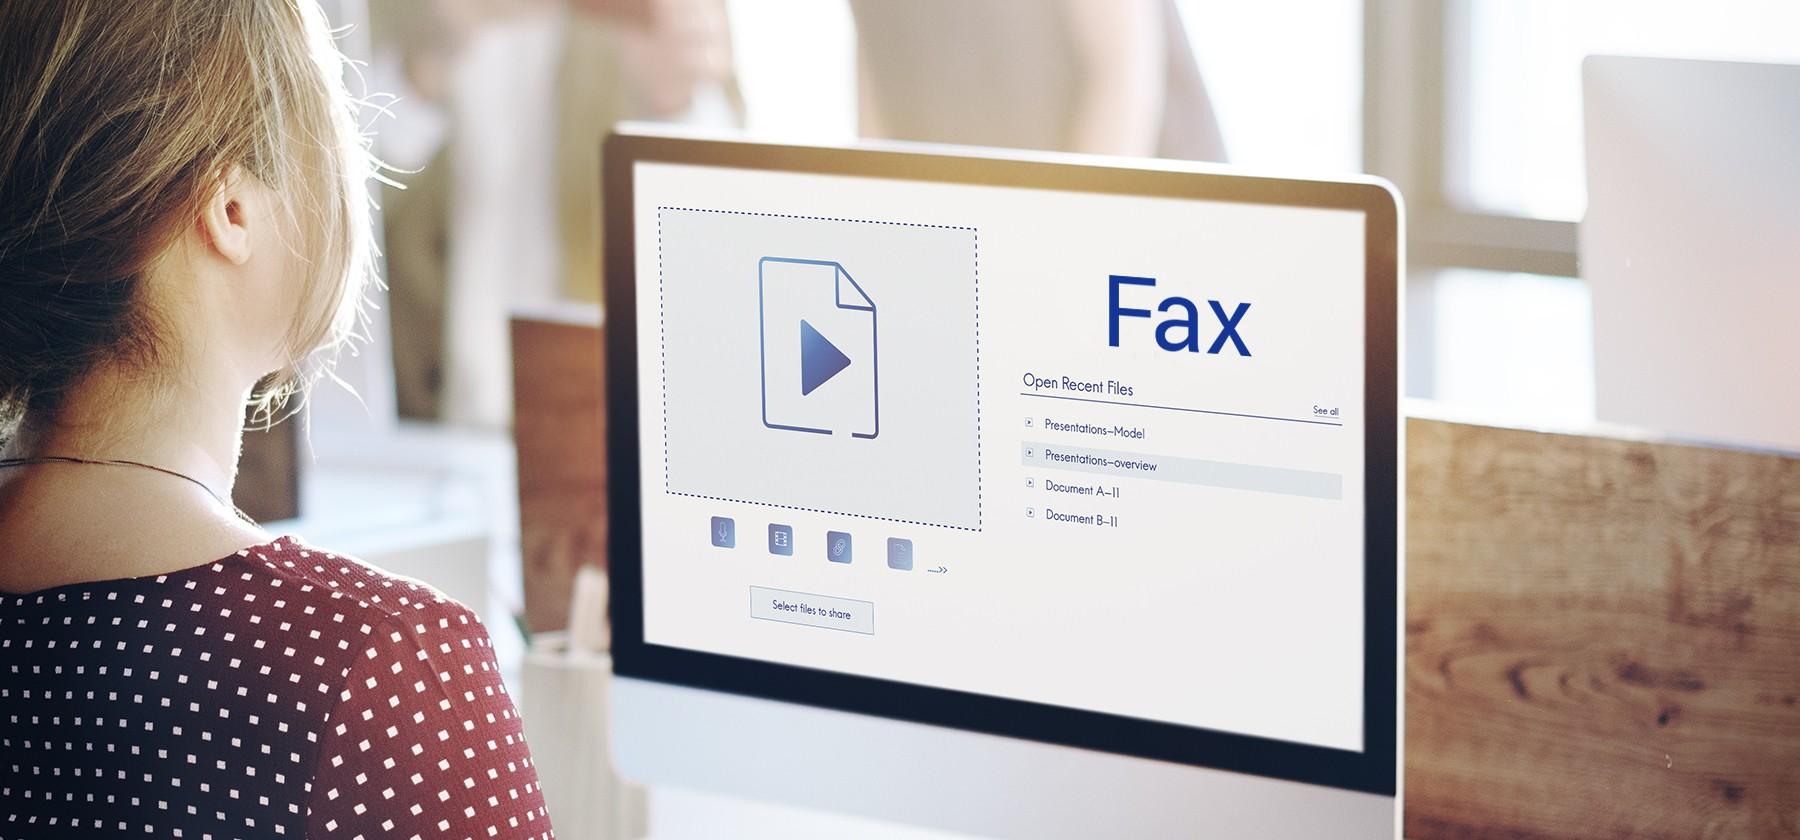 Fax server virtuale. Fax in Cloud